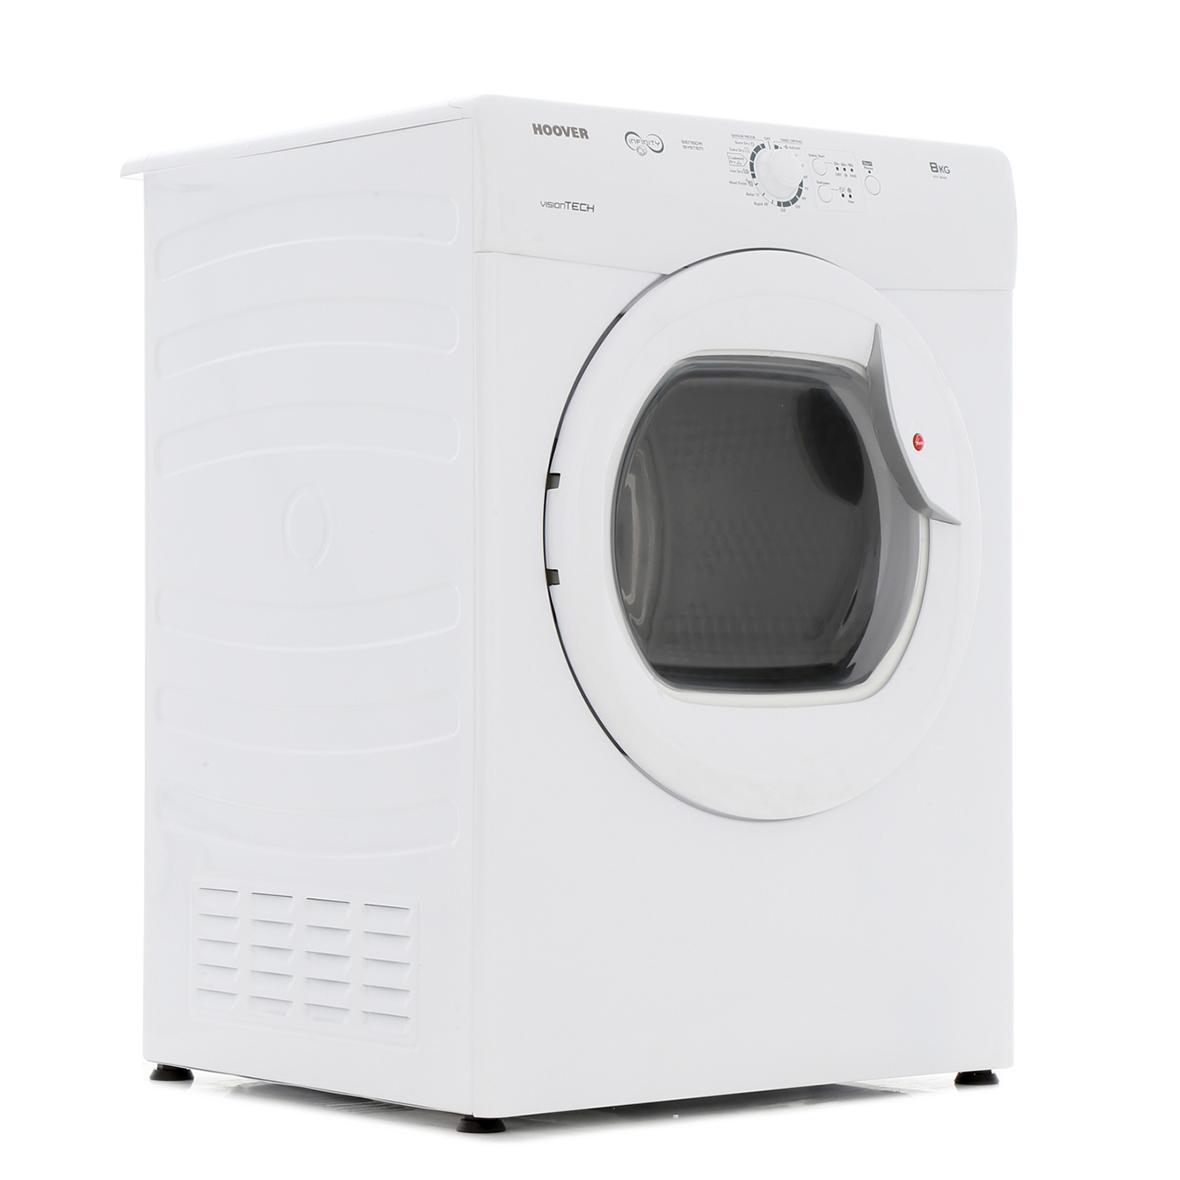 Hoover VTV581NC-80 Vented Dryer